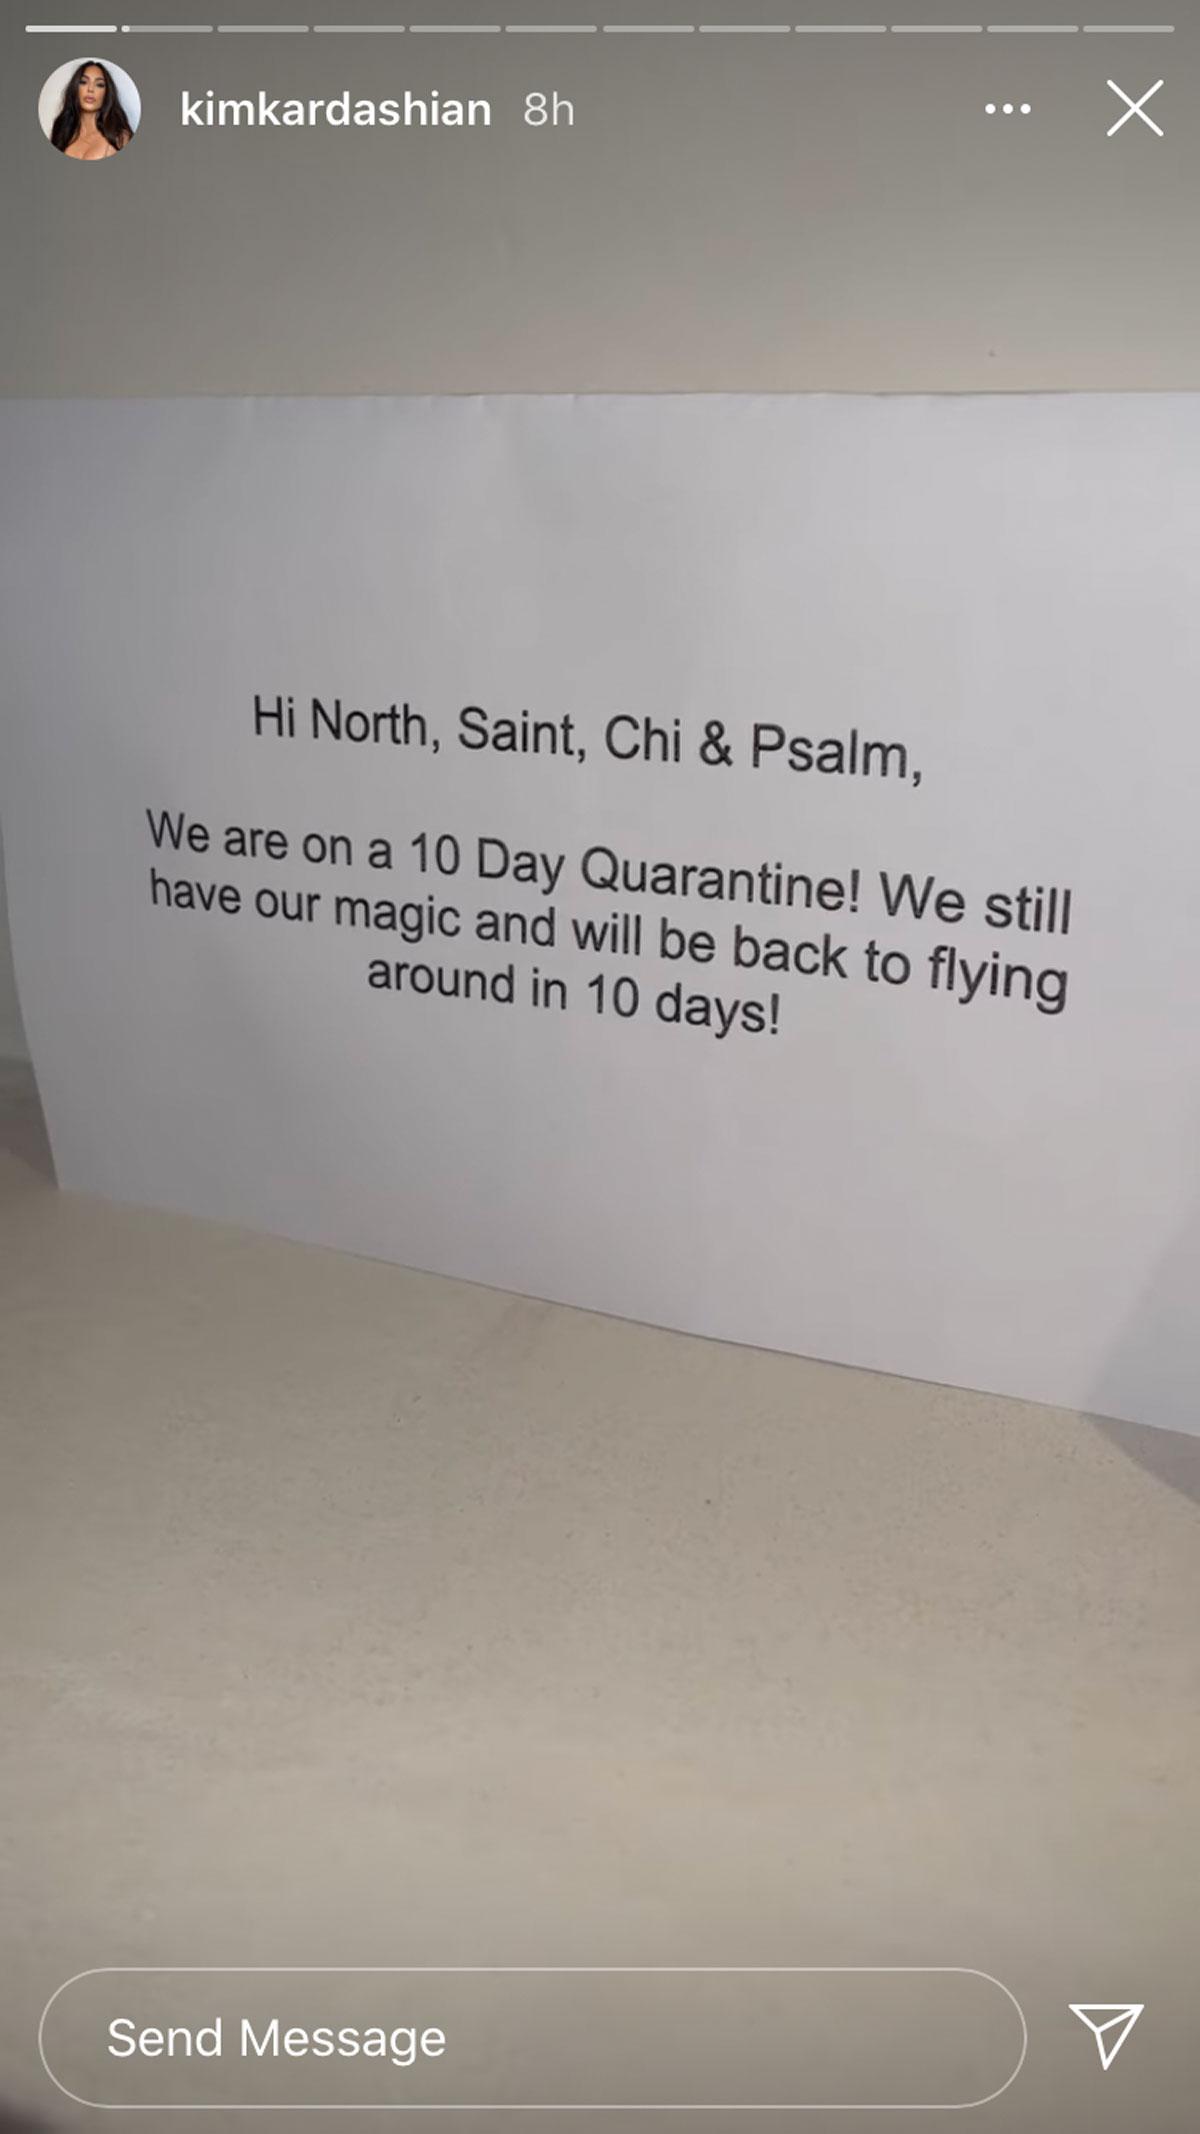 Kim Kardashian is so tired of the elf on the shelf that she put 'em in quarantine!